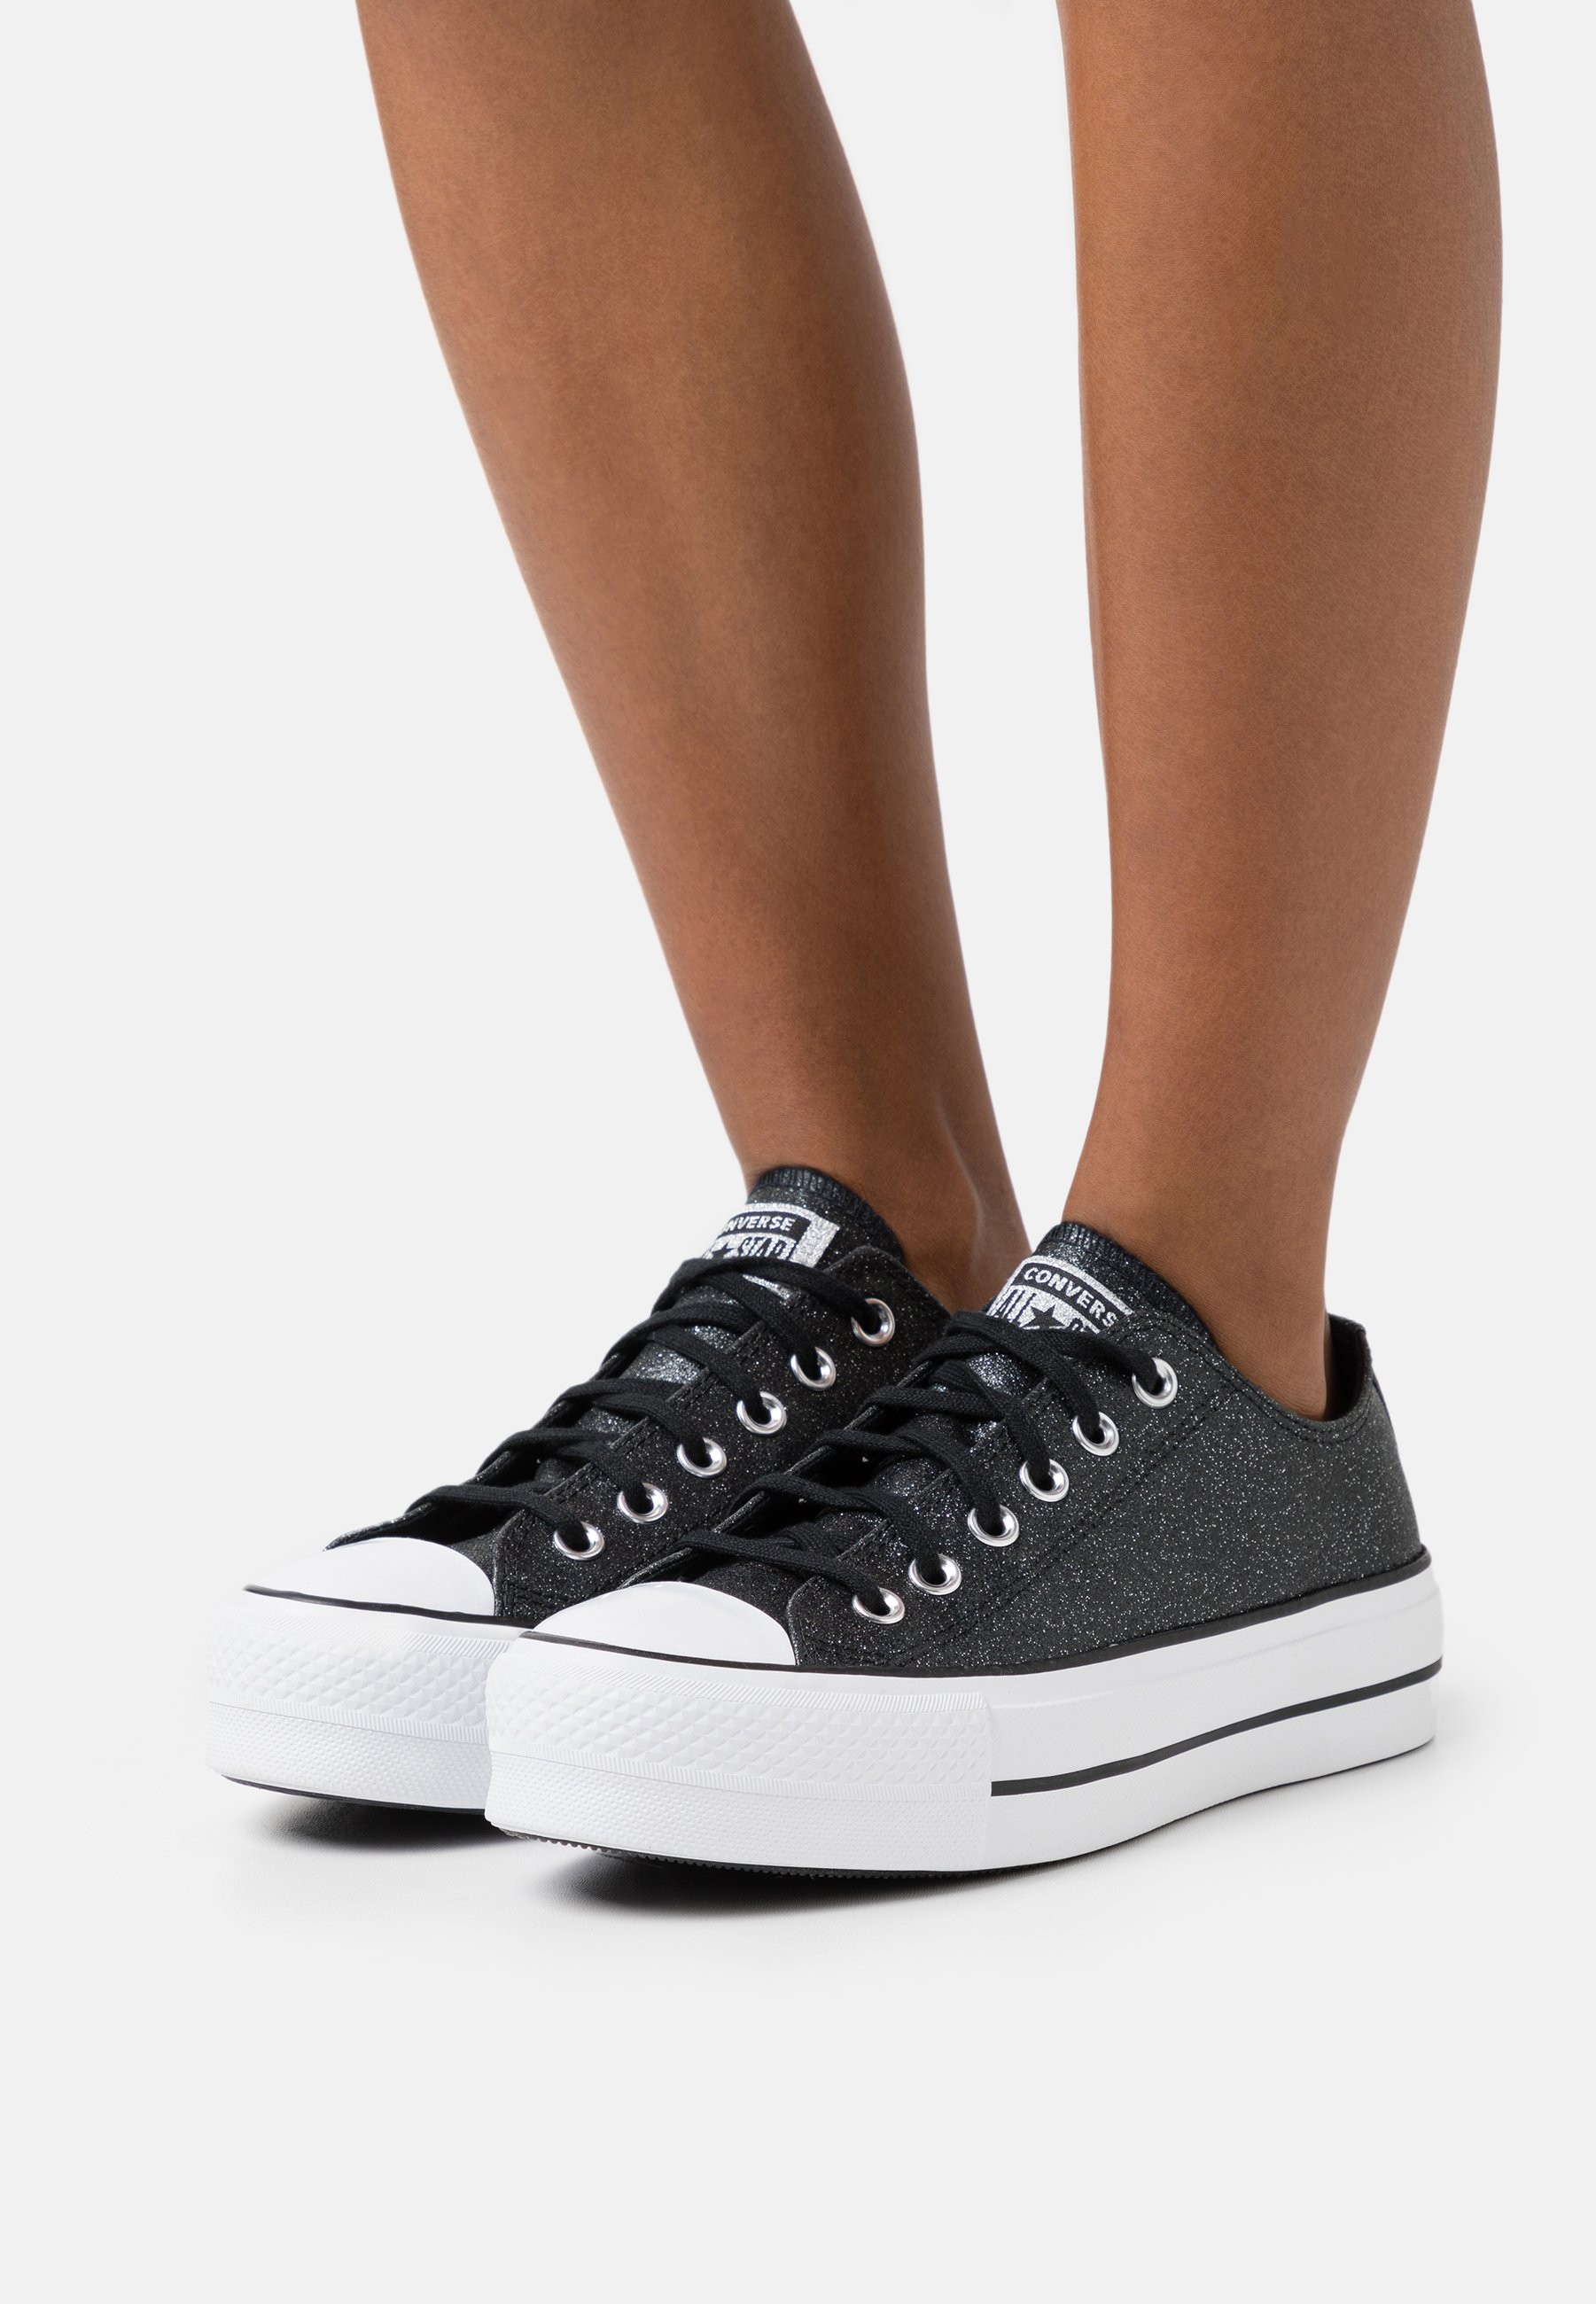 Converse CHUCK TAYLOR ALL STAR PLATFORM GLITTER - Sneakers basse ...